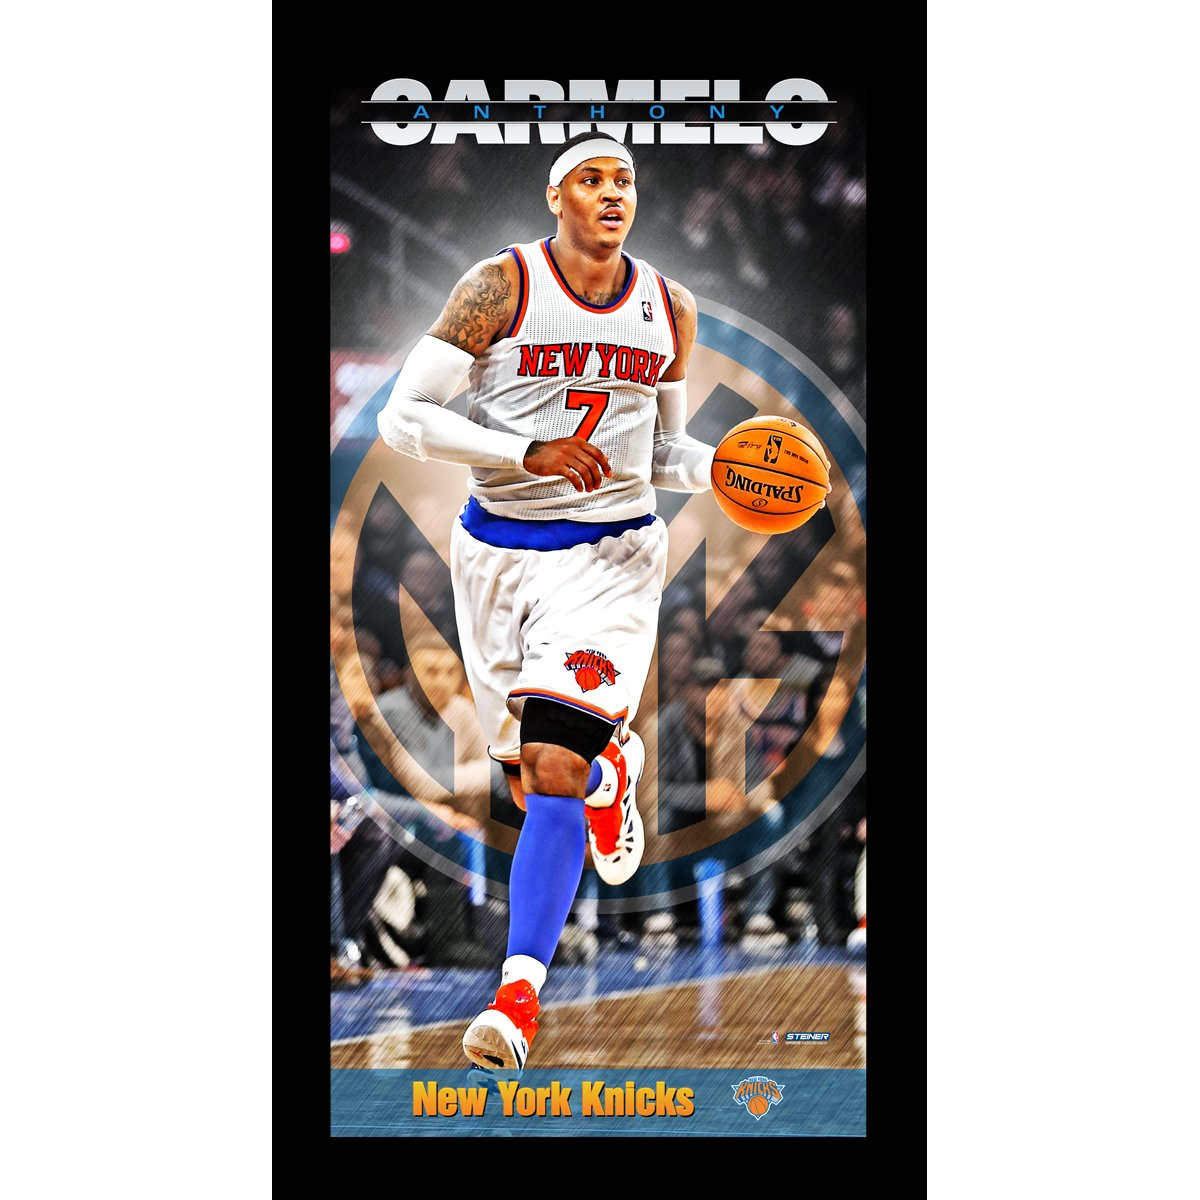 NBA New York Knicks Carmelo Anthony Player Profile Wall Art 9.5x19 Framed Photo